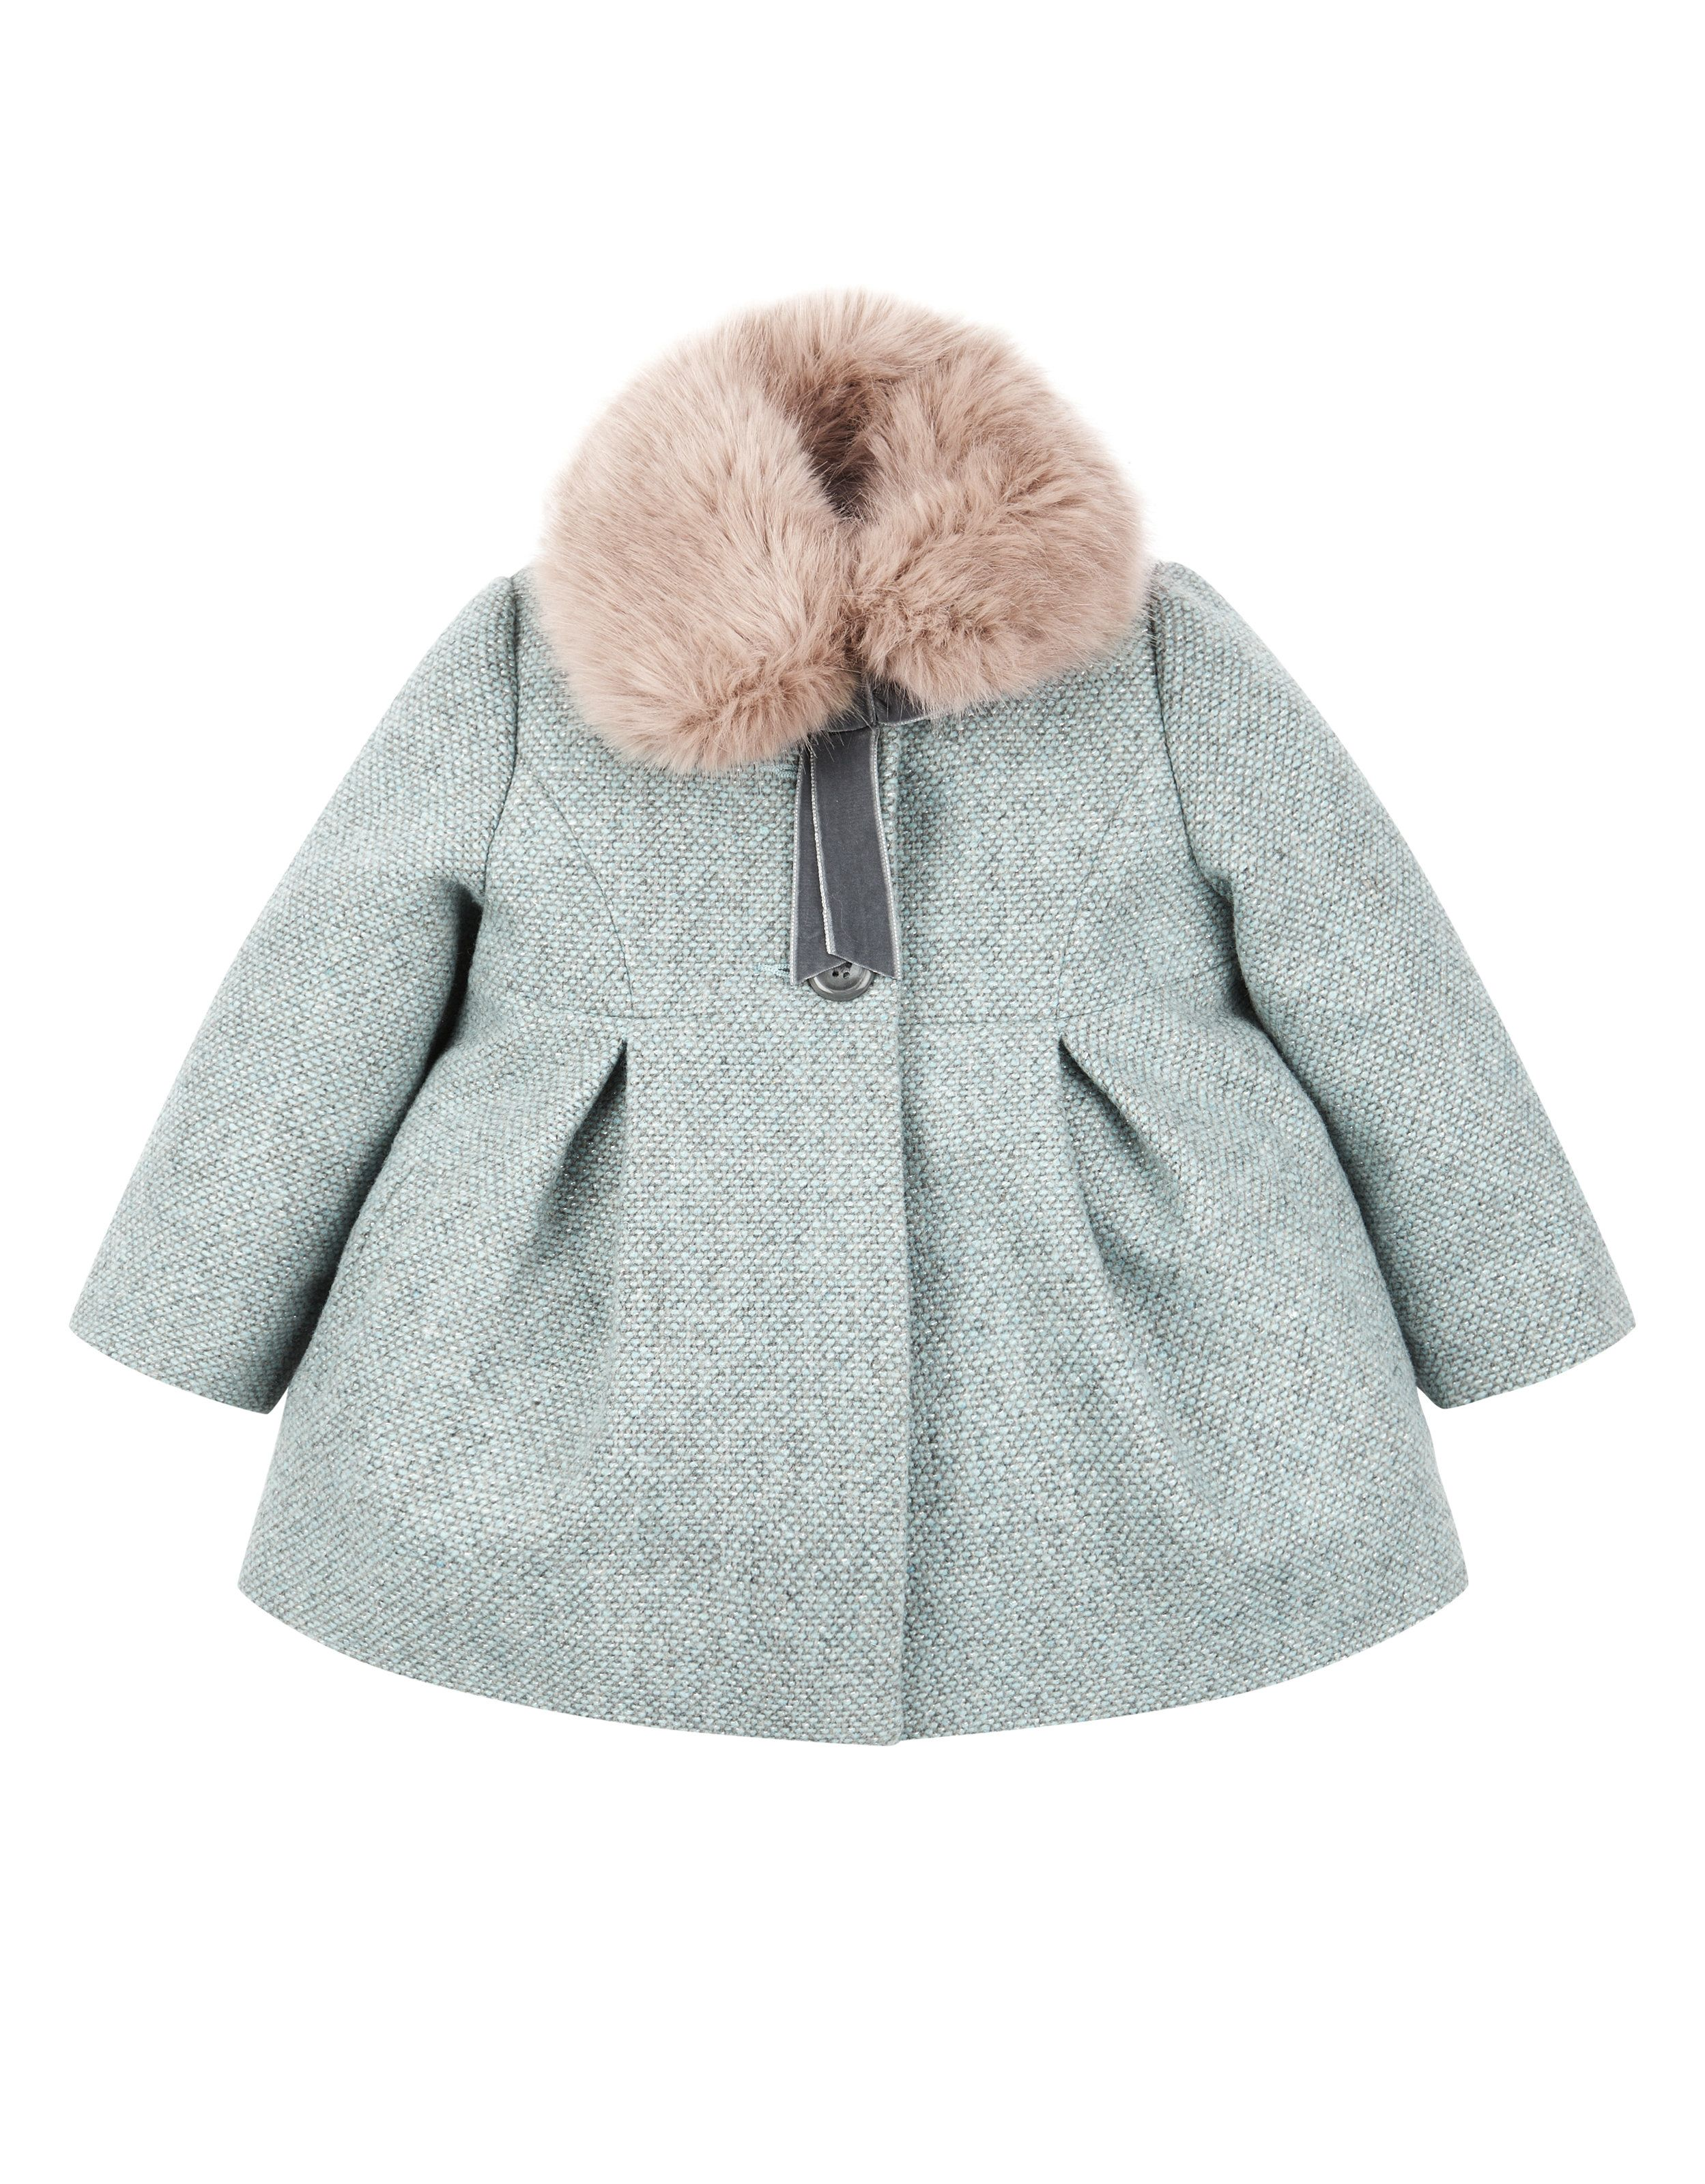 Baby Alice Aqua Tweed Coat